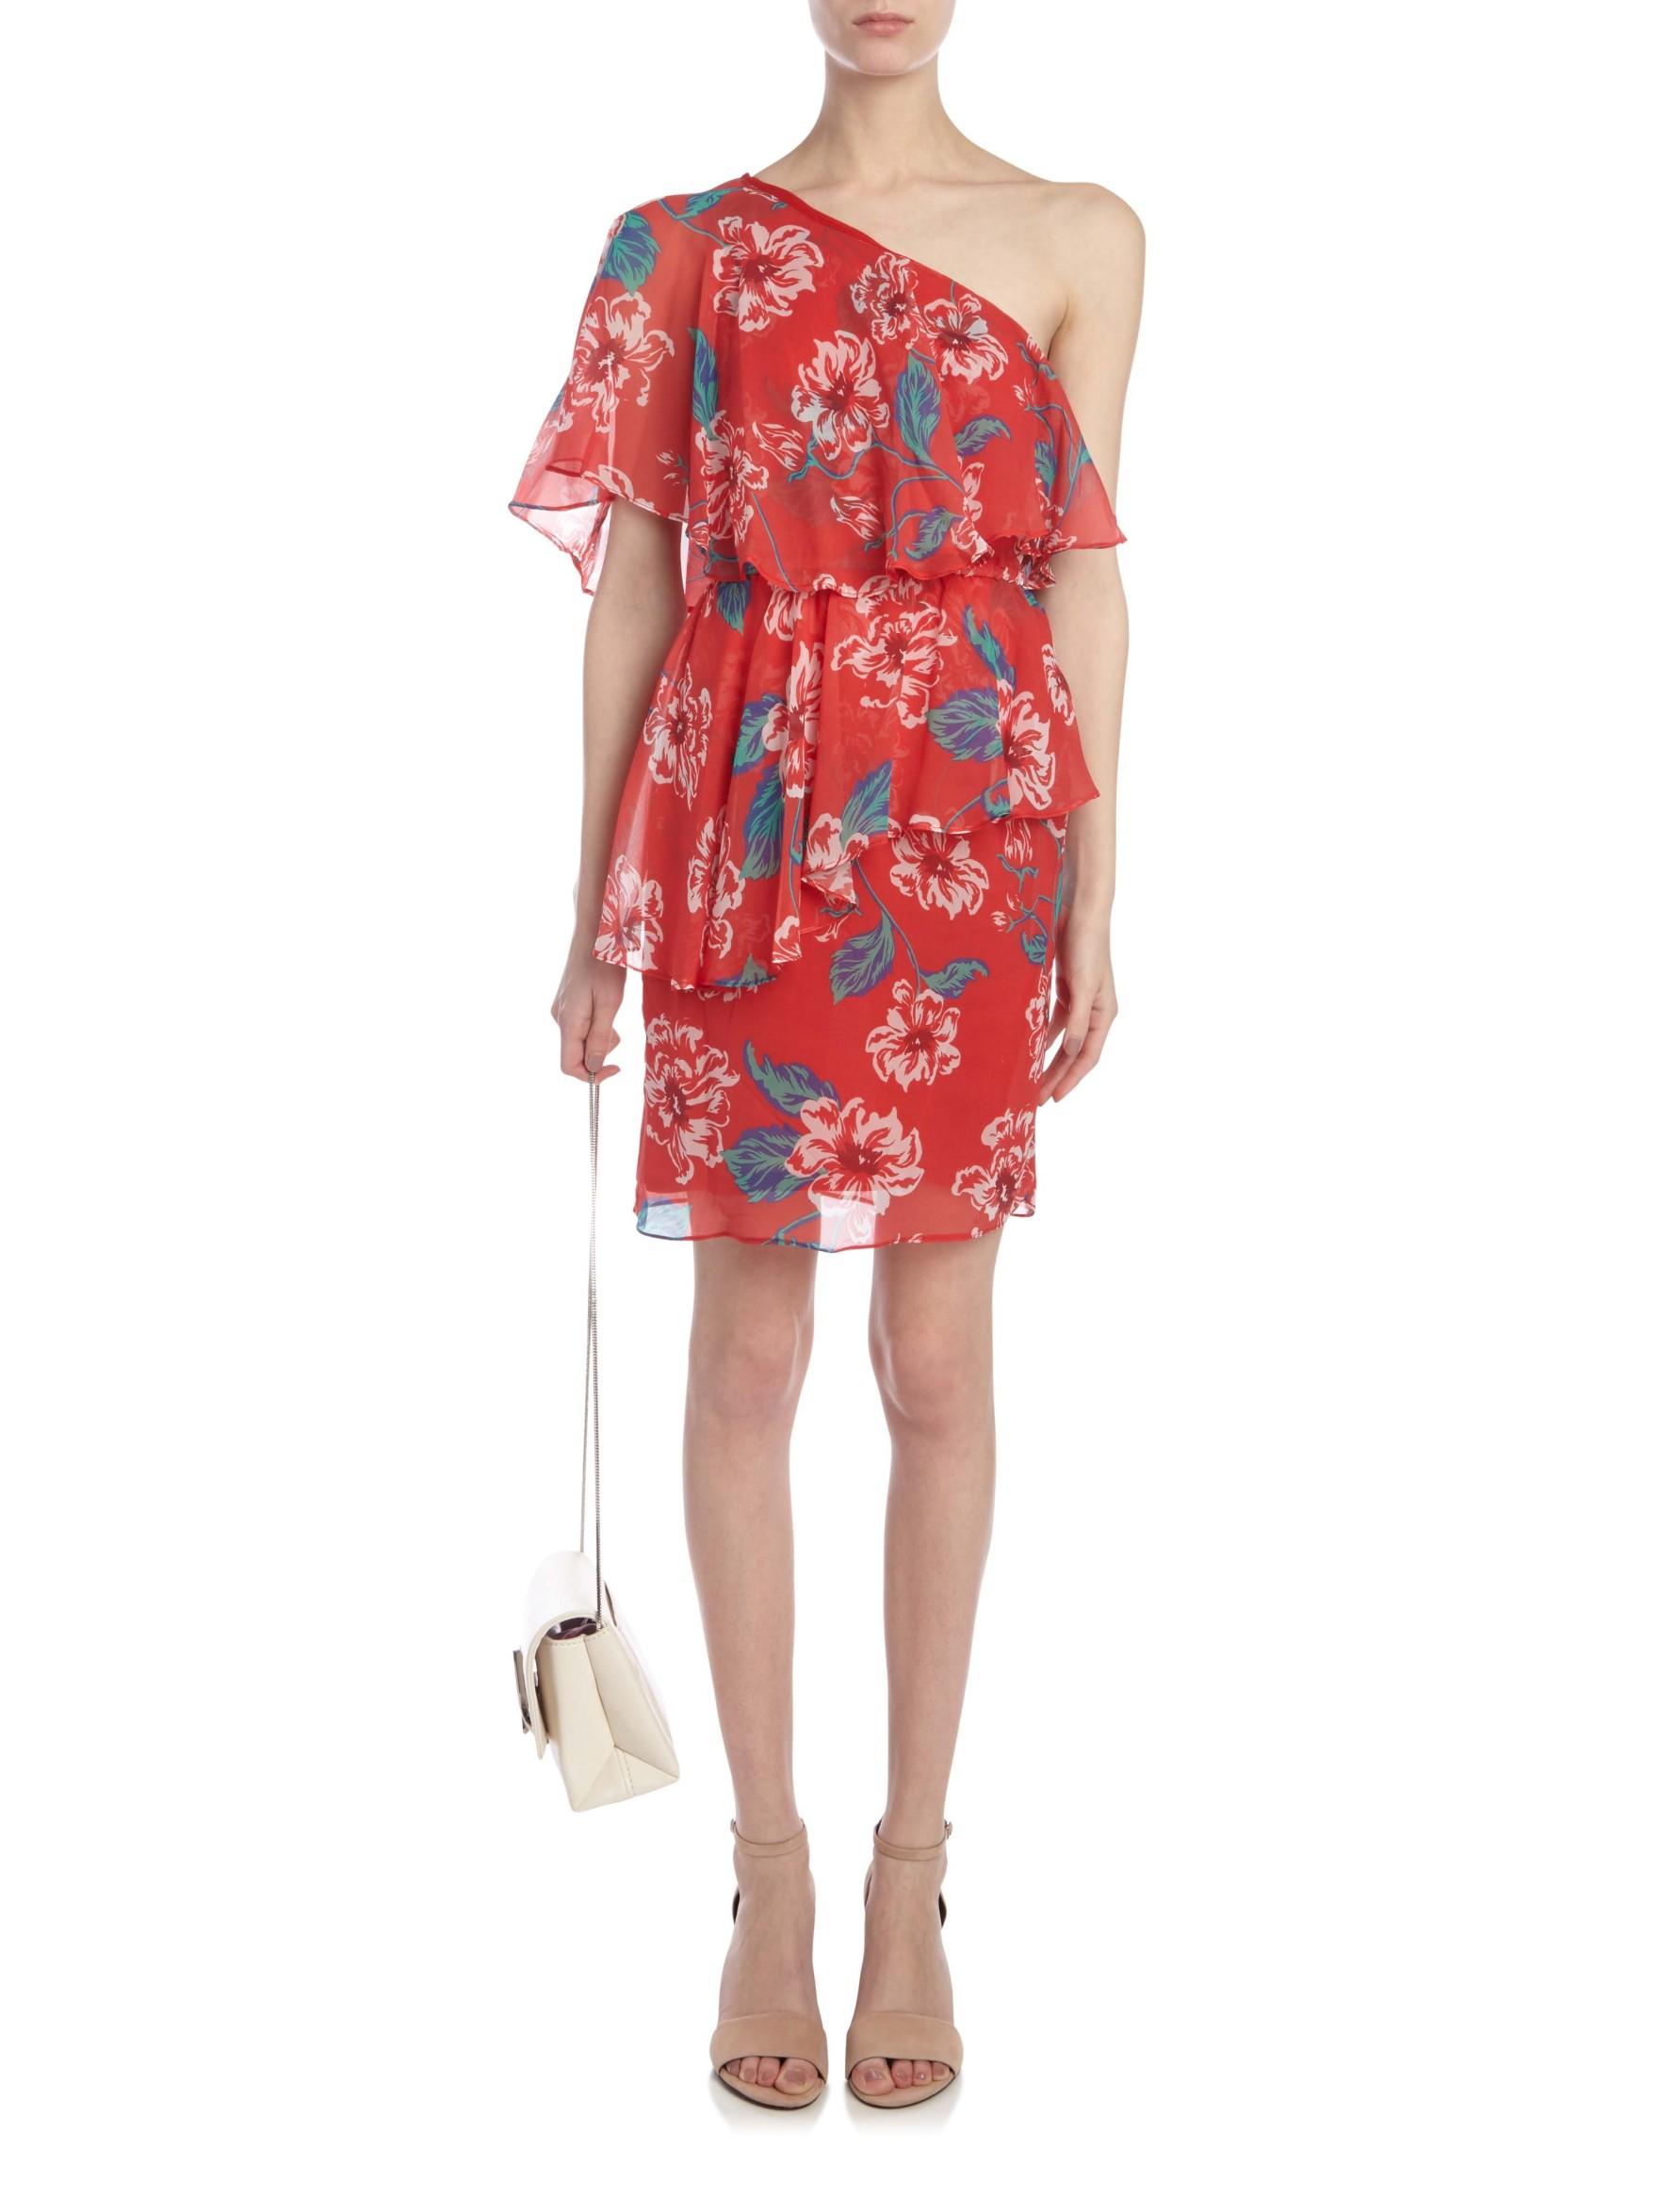 Nicholas Floral One Shoulder Dress In Red